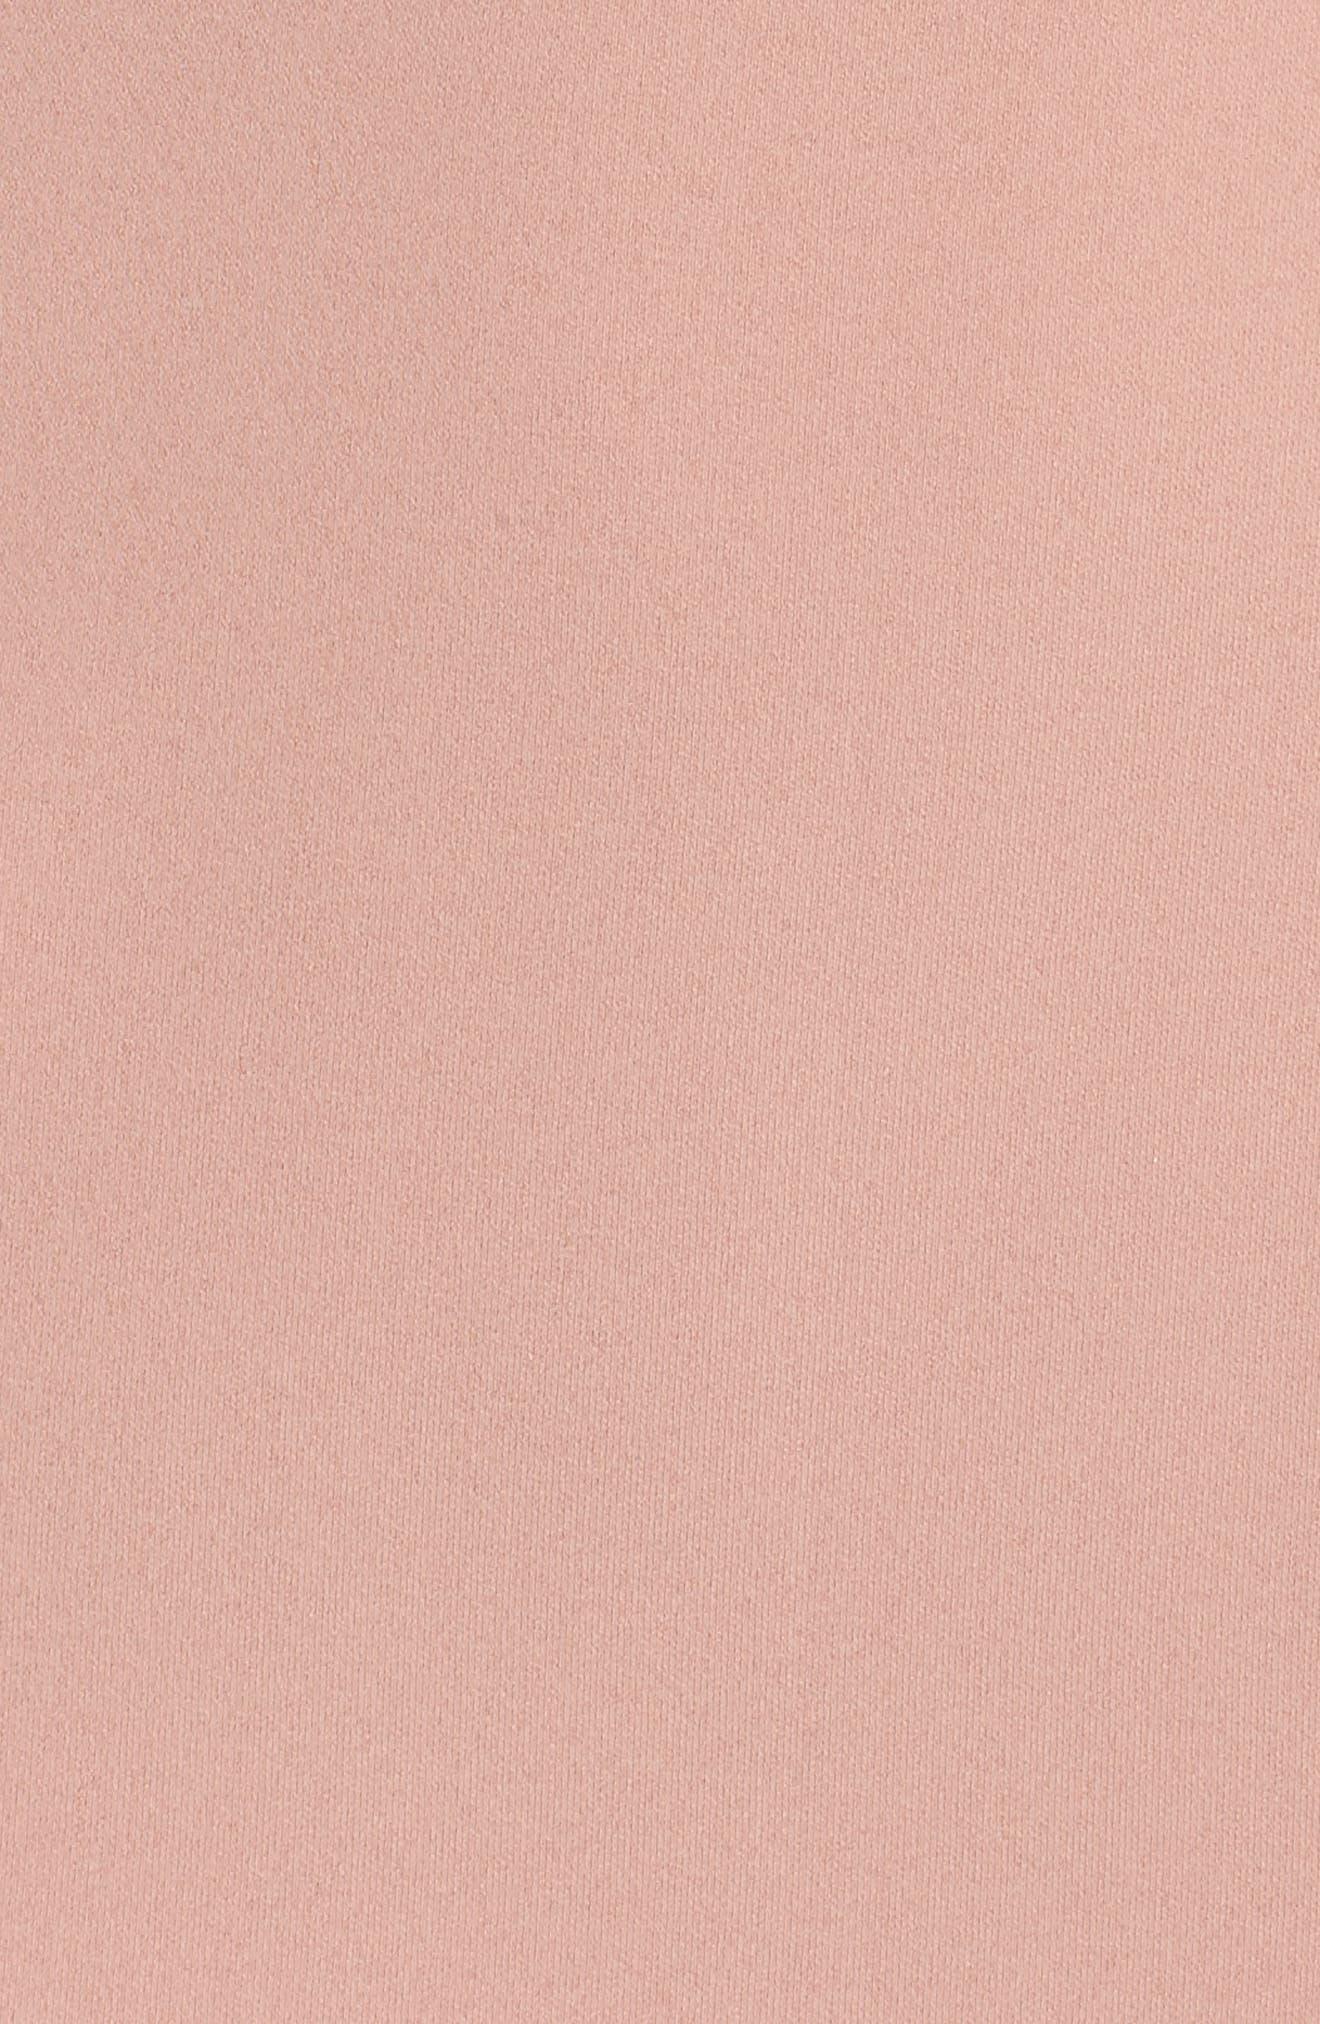 'Solange' Off the Shoulder Midi Dress,                             Alternate thumbnail 22, color,